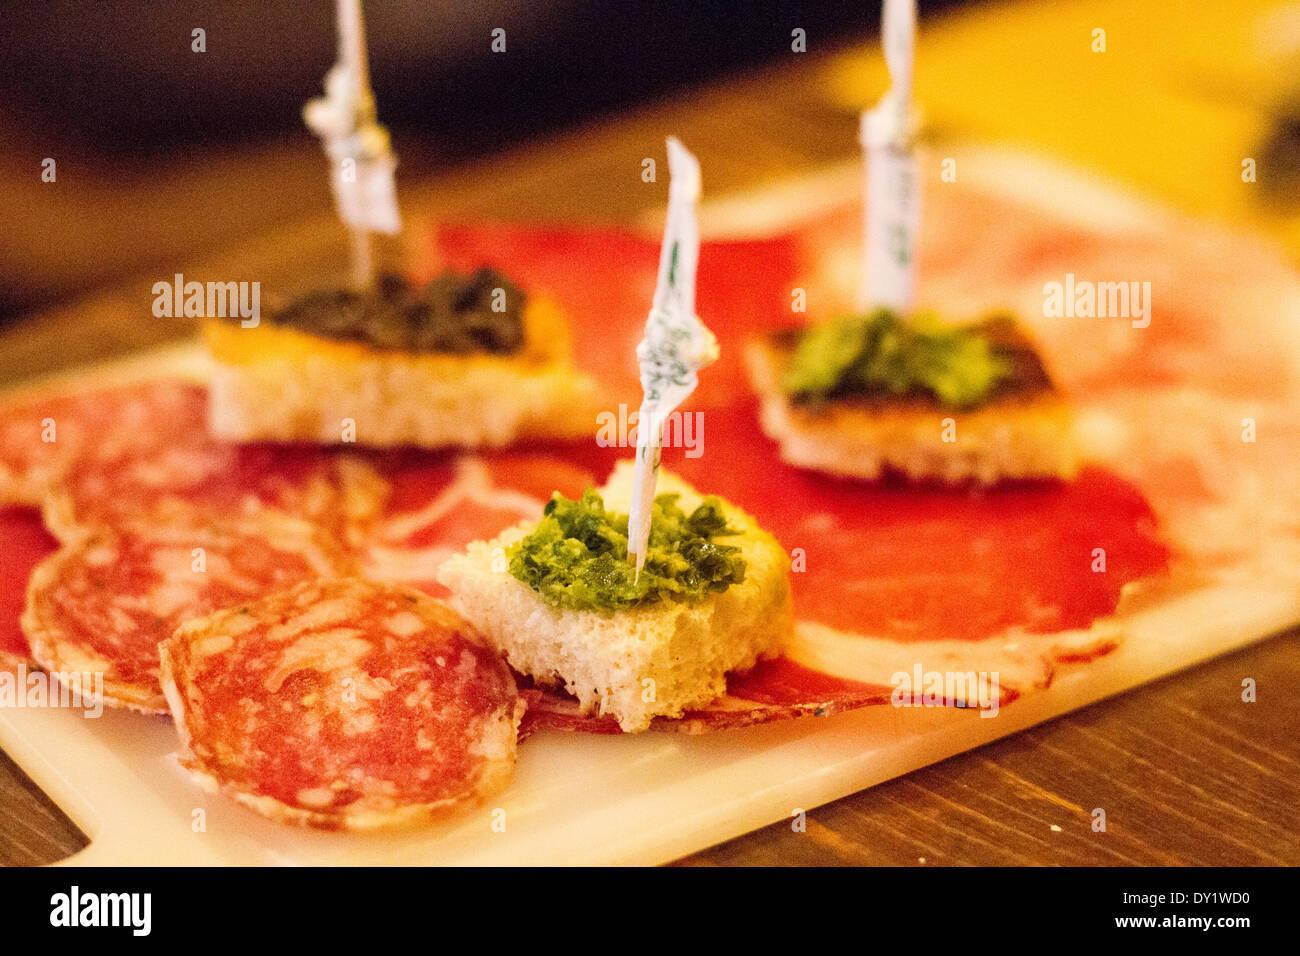 Typisch italienische Küche in Ferrara, Emilia Romagna, Italien Stockbild